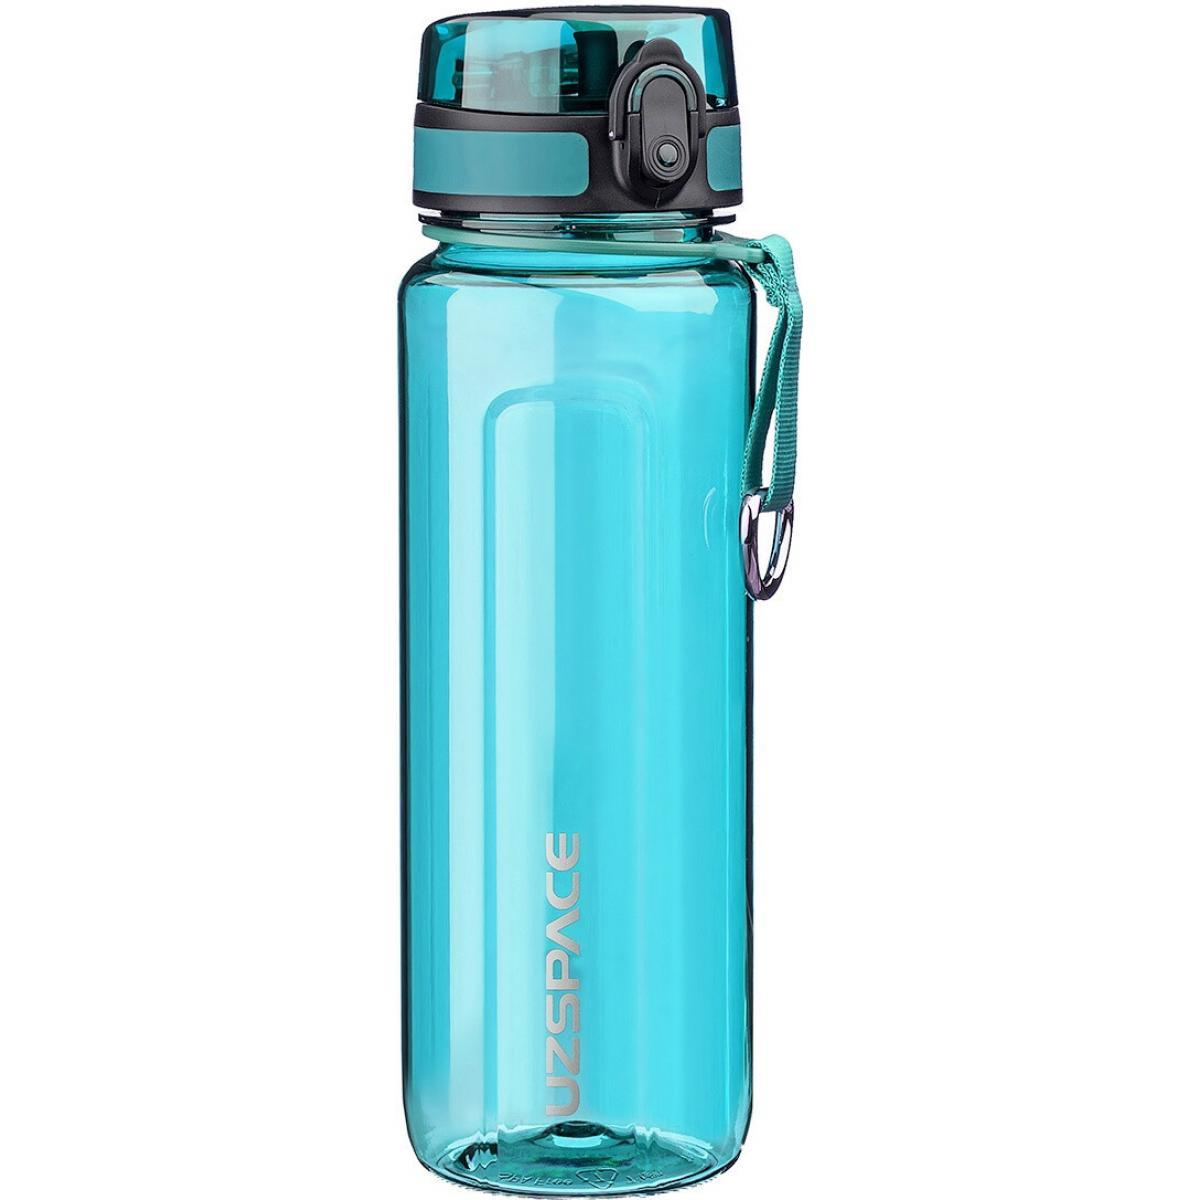 Бутылка для воды UZSPACE U-type 6019 750 мл, голубая